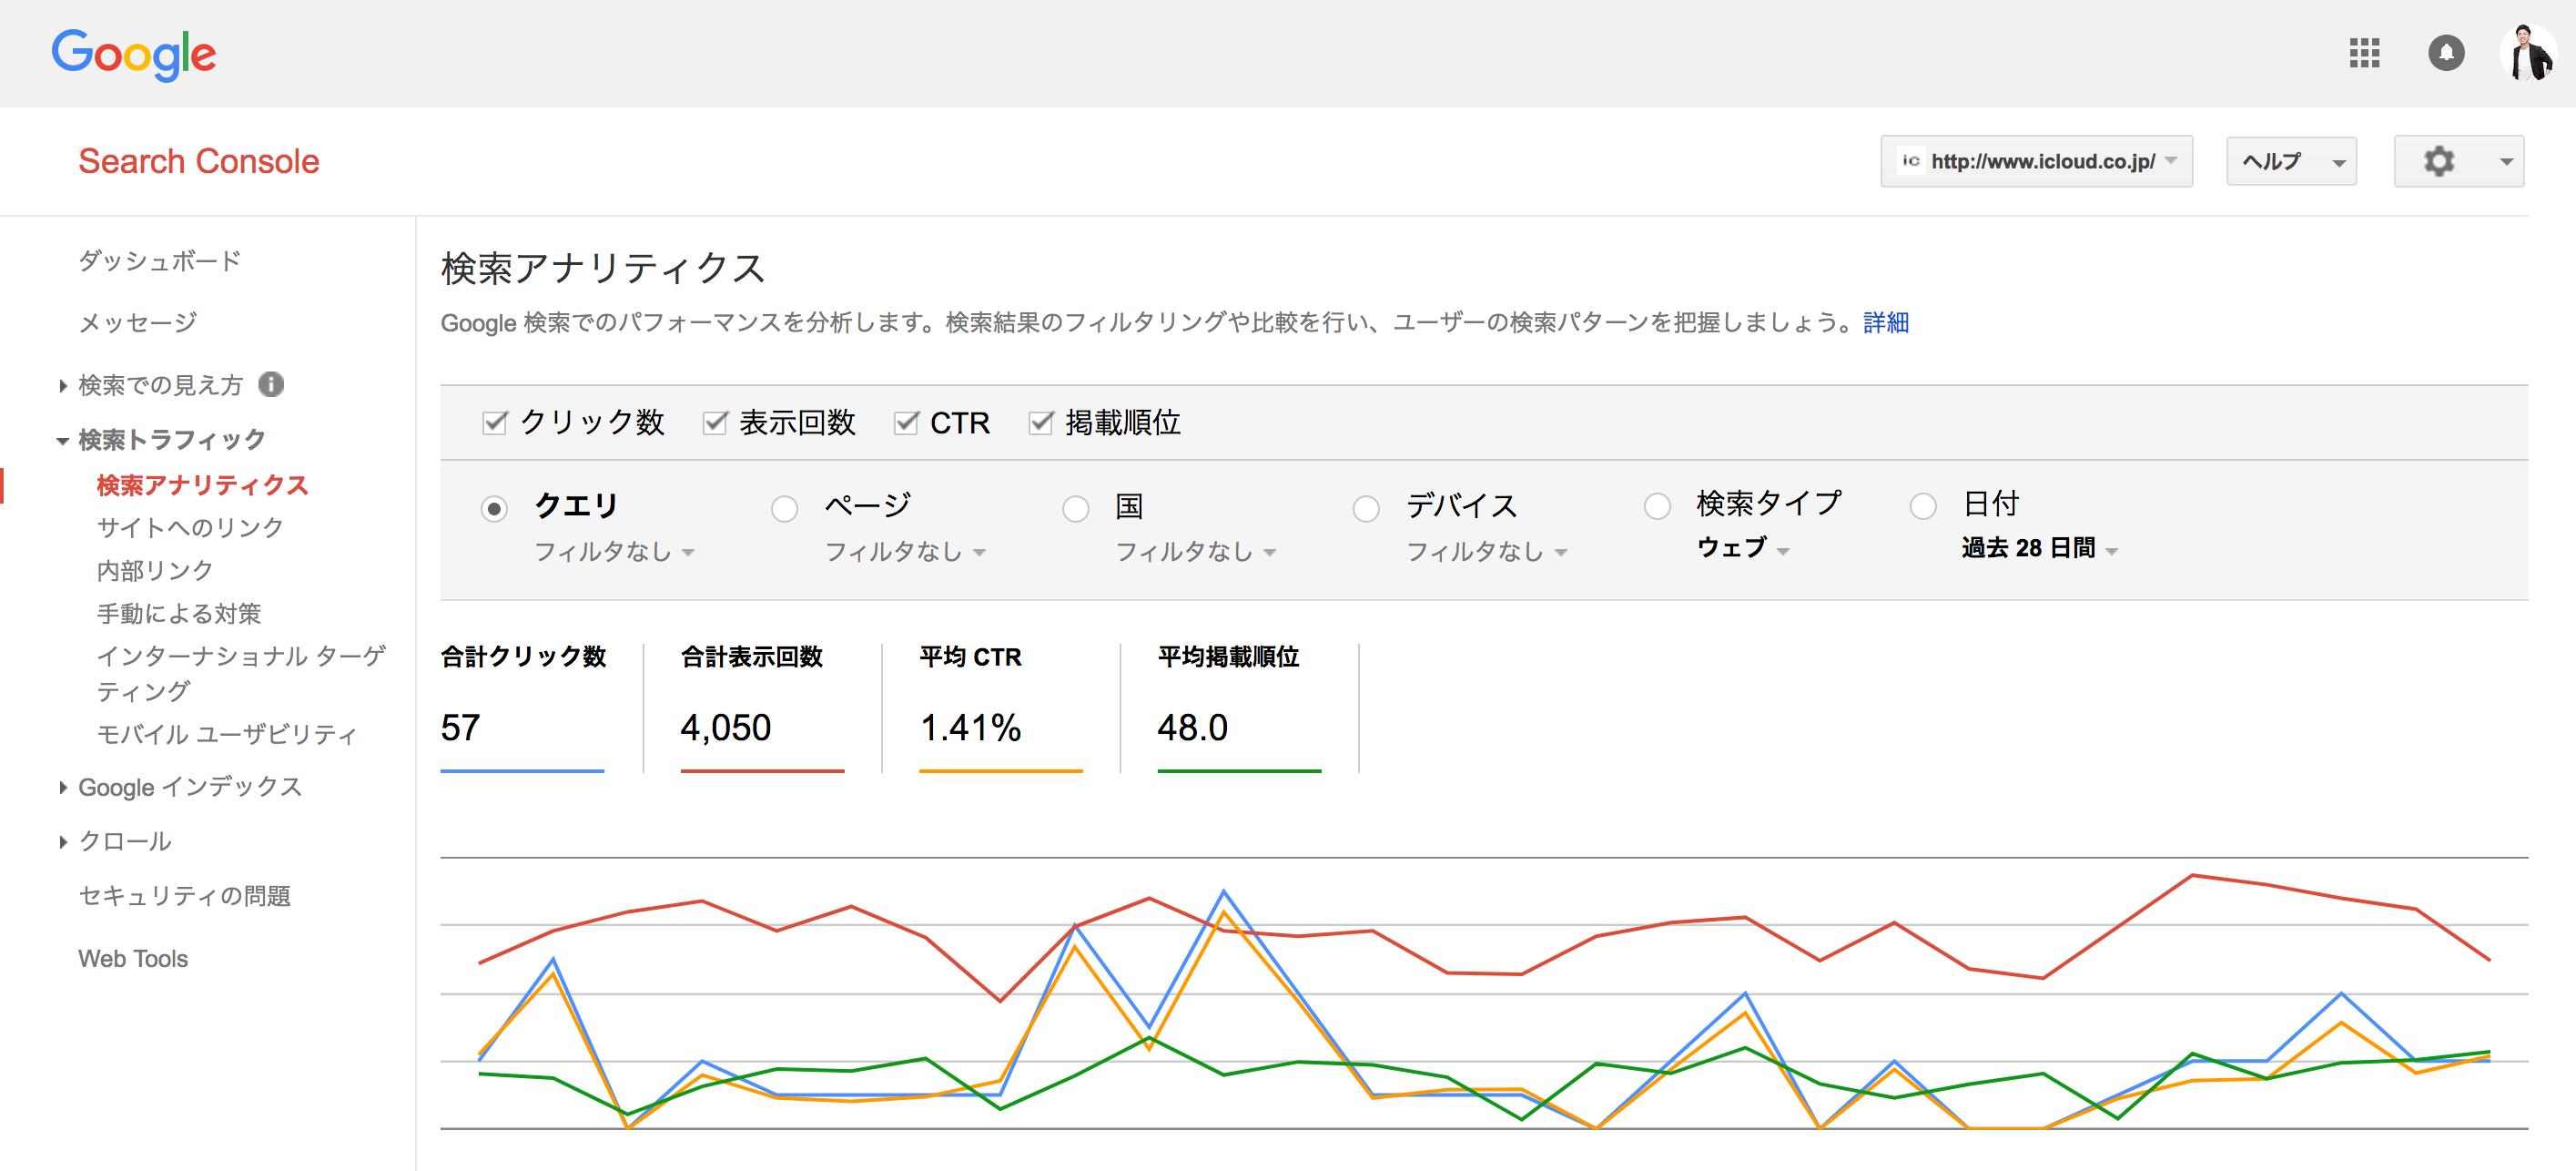 Google Search Consoleの検索アナリティクス画面